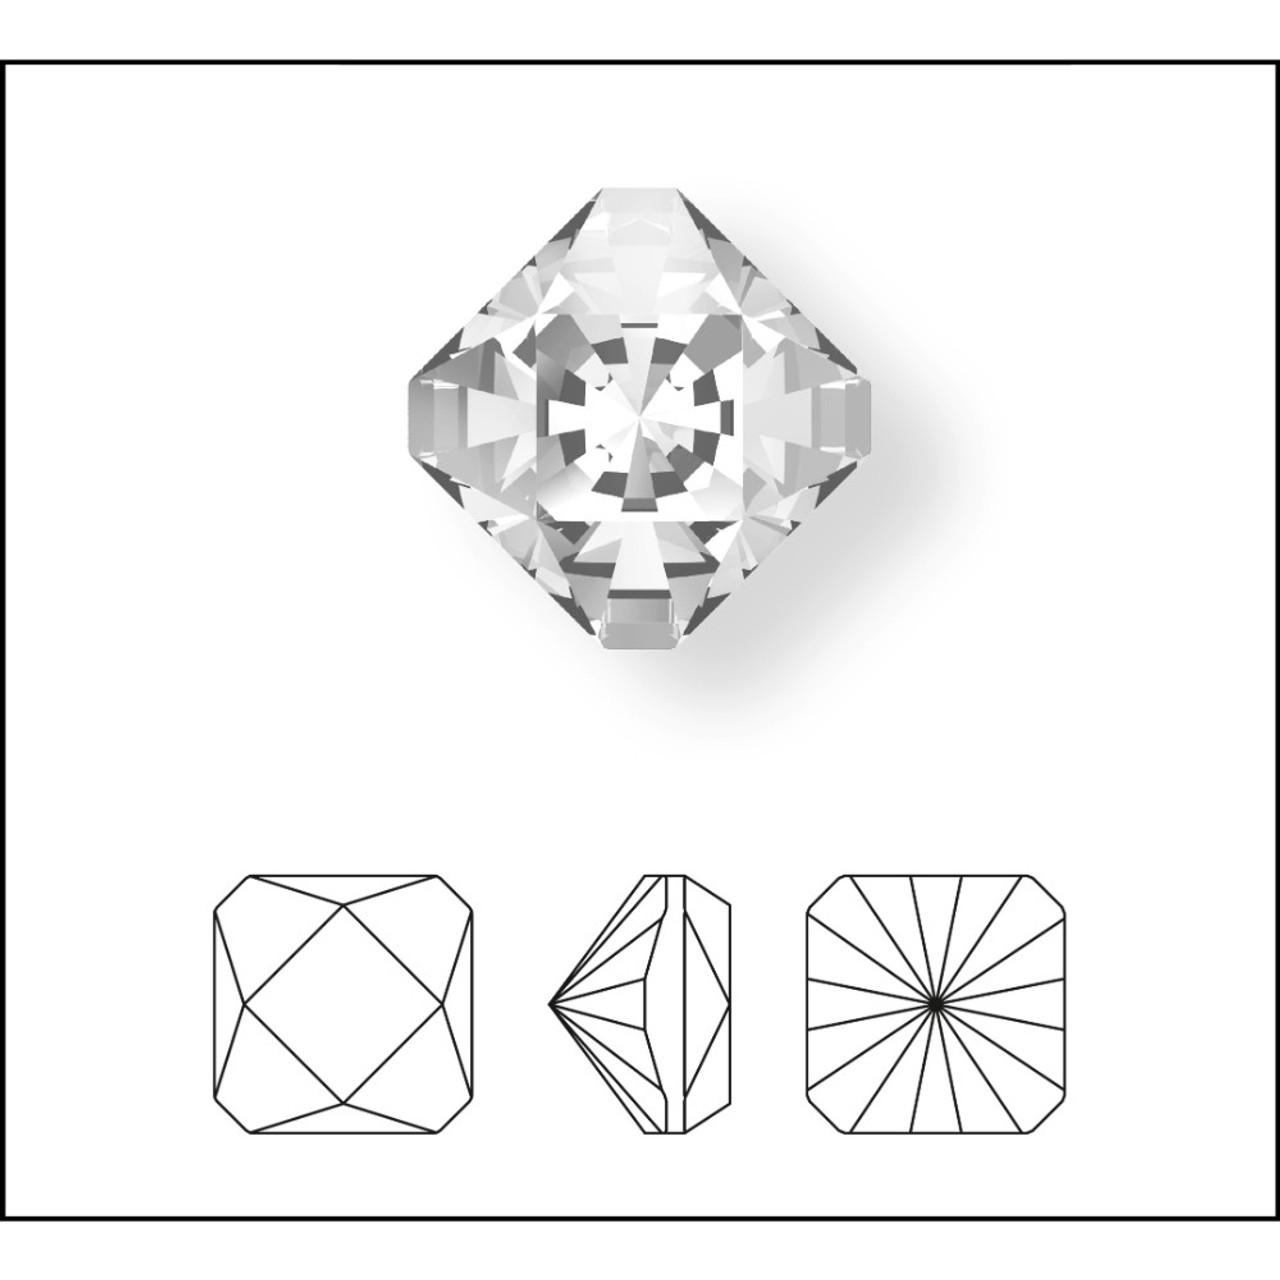 bde19c40c91 Swarovski 4499 10mm Kaleidoscope Square Fancy Stones Emerald ...